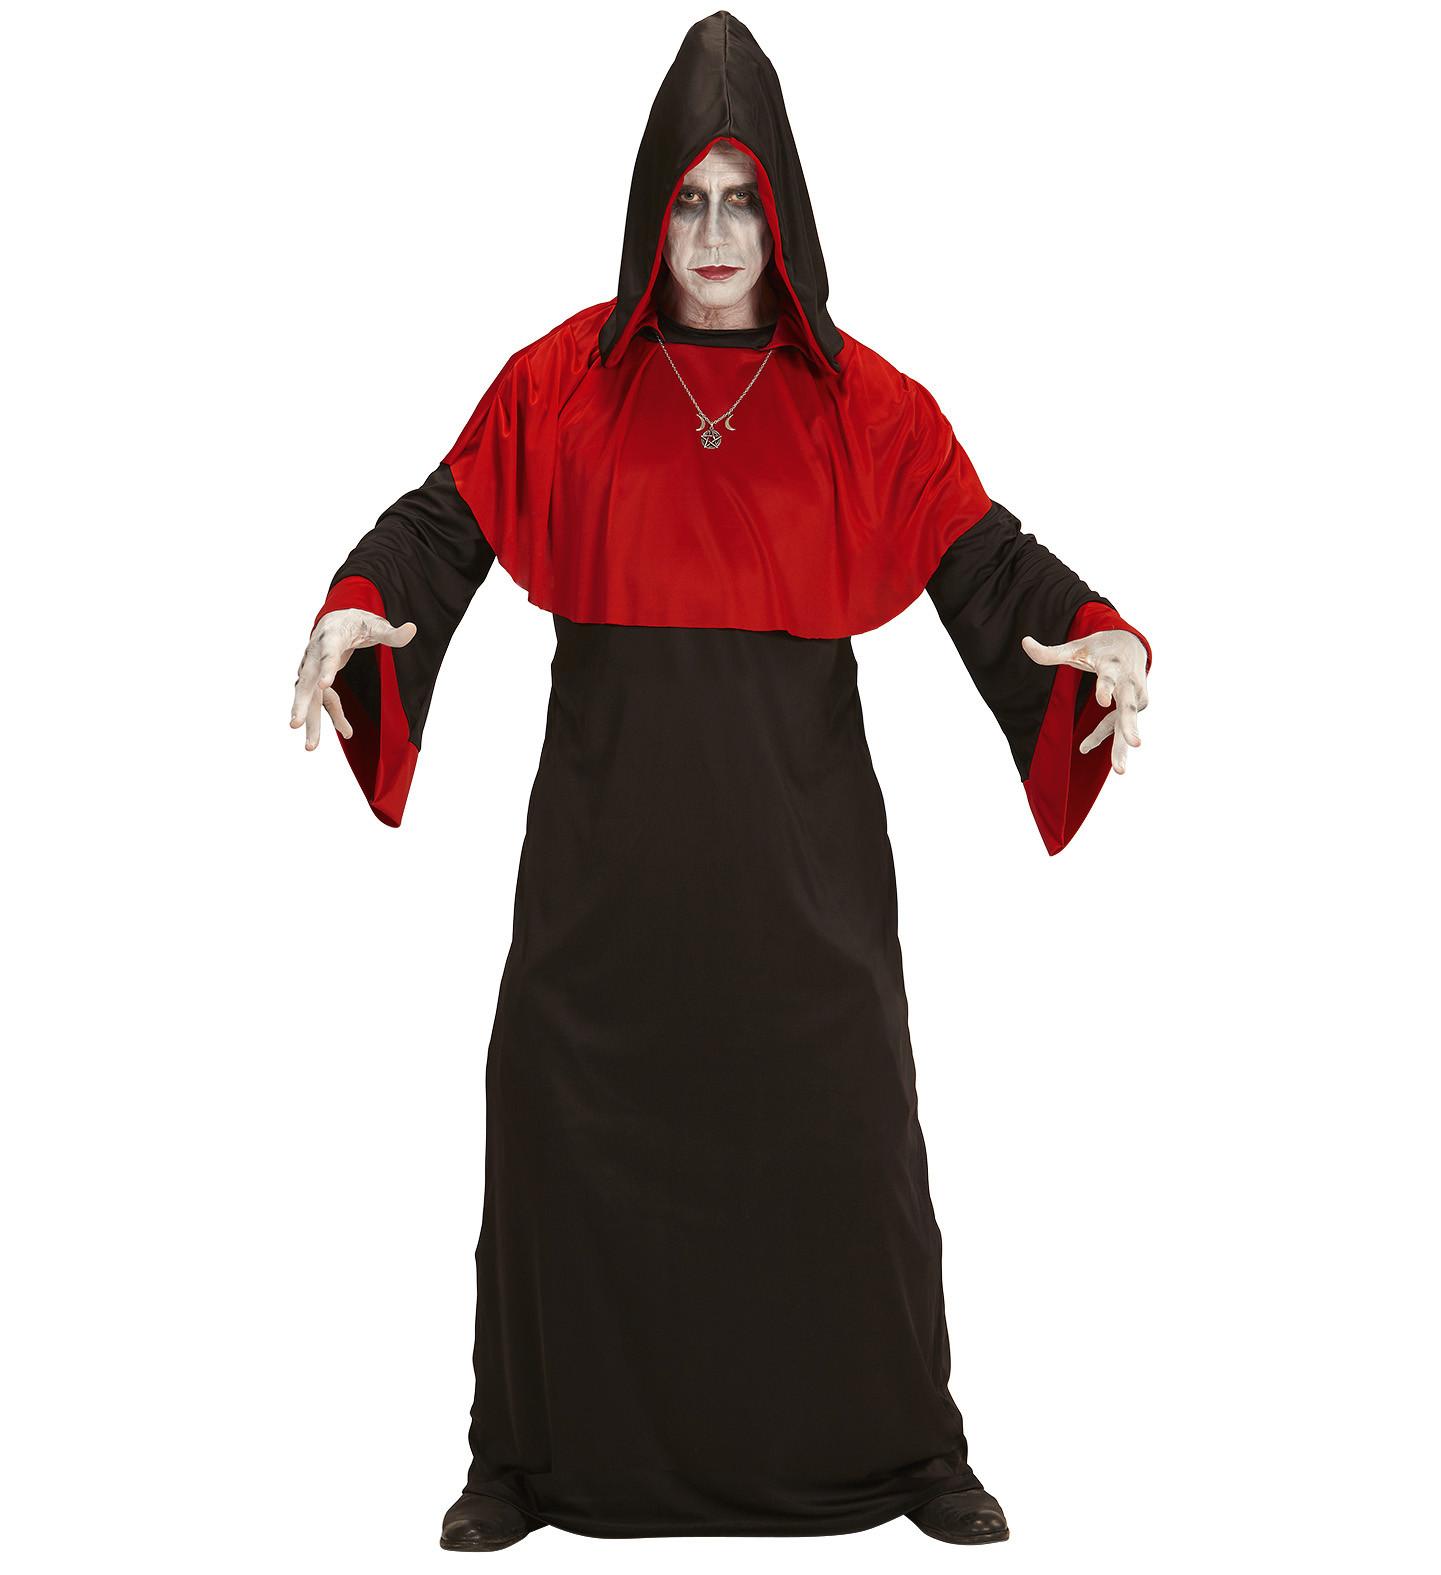 Travestimenti Halloween Uomo.Costume Carnevale Uomo Demone Travestimento Halloween Ps 25616